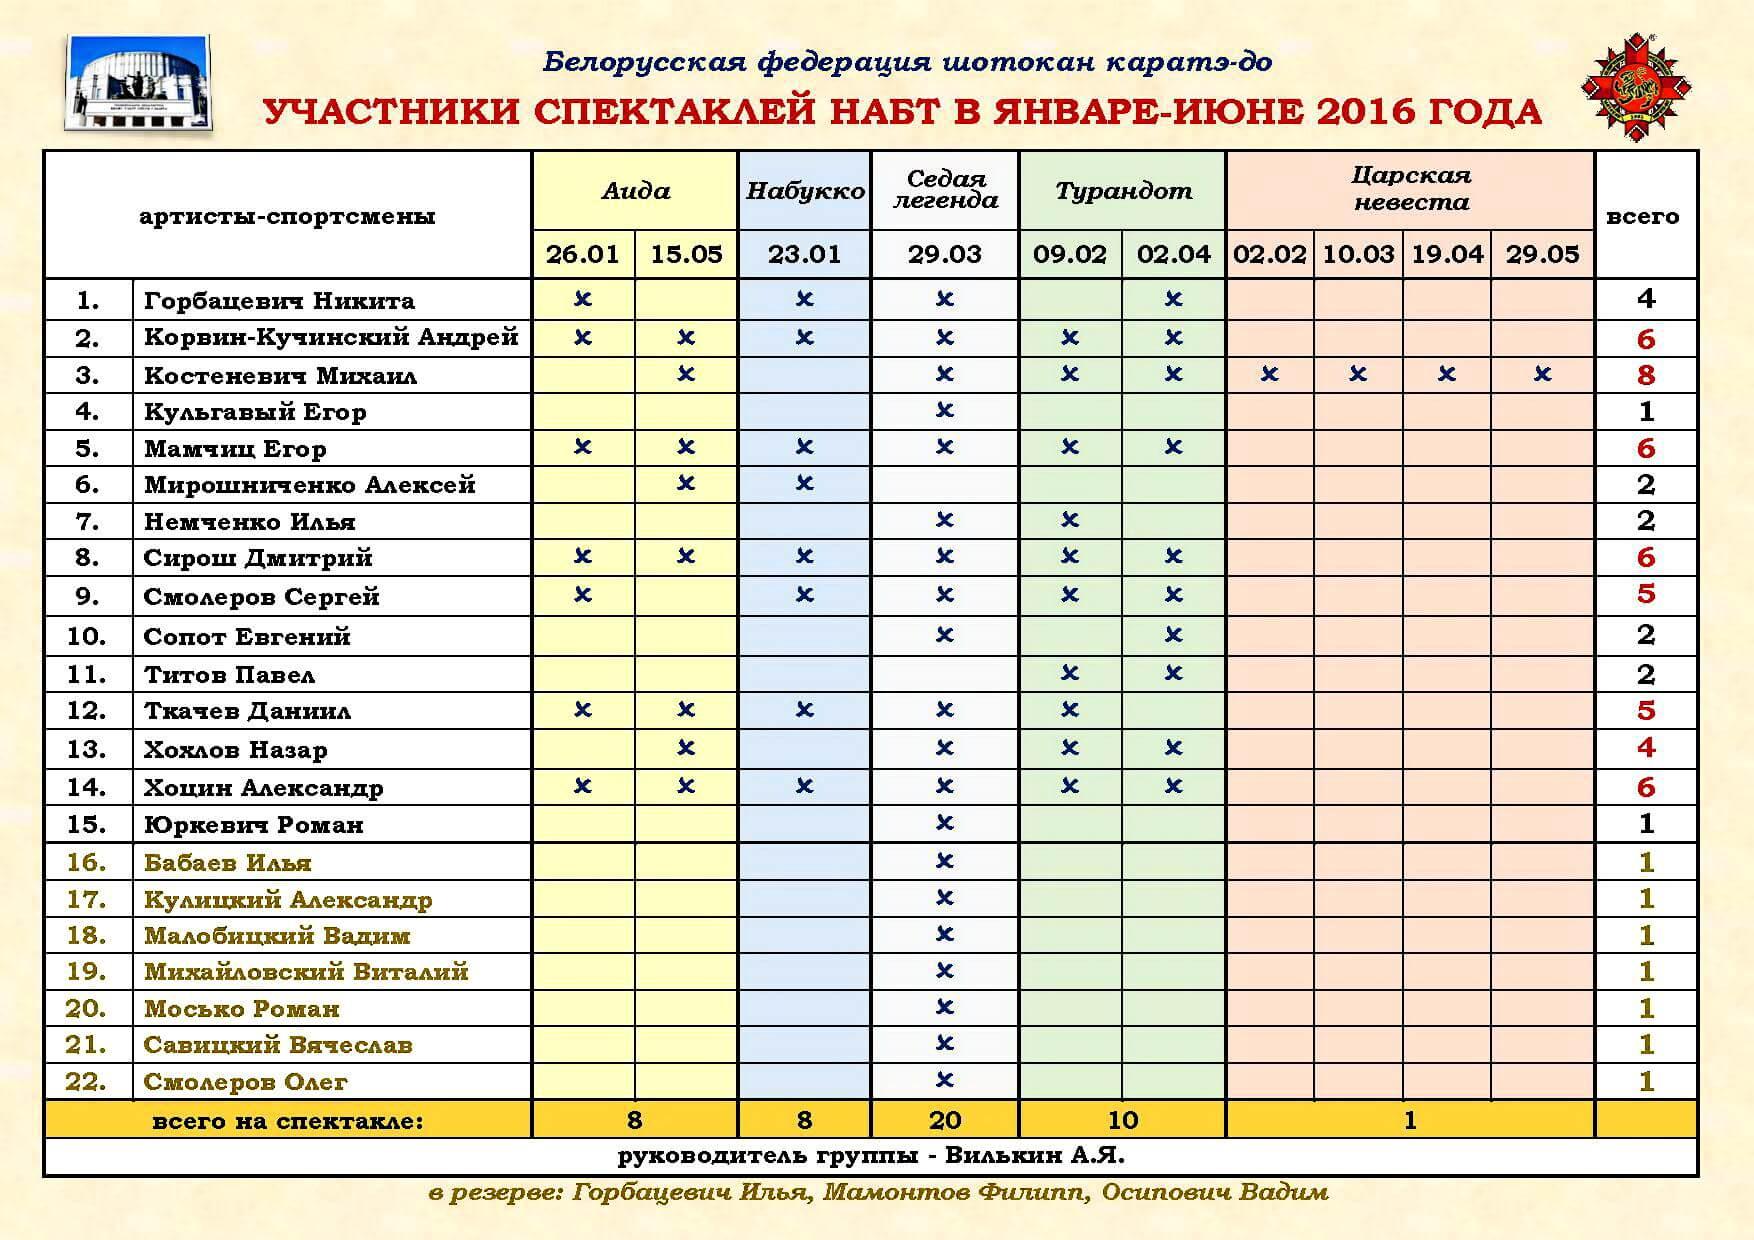 НАБТ 2016 01-06 Участники БФШК